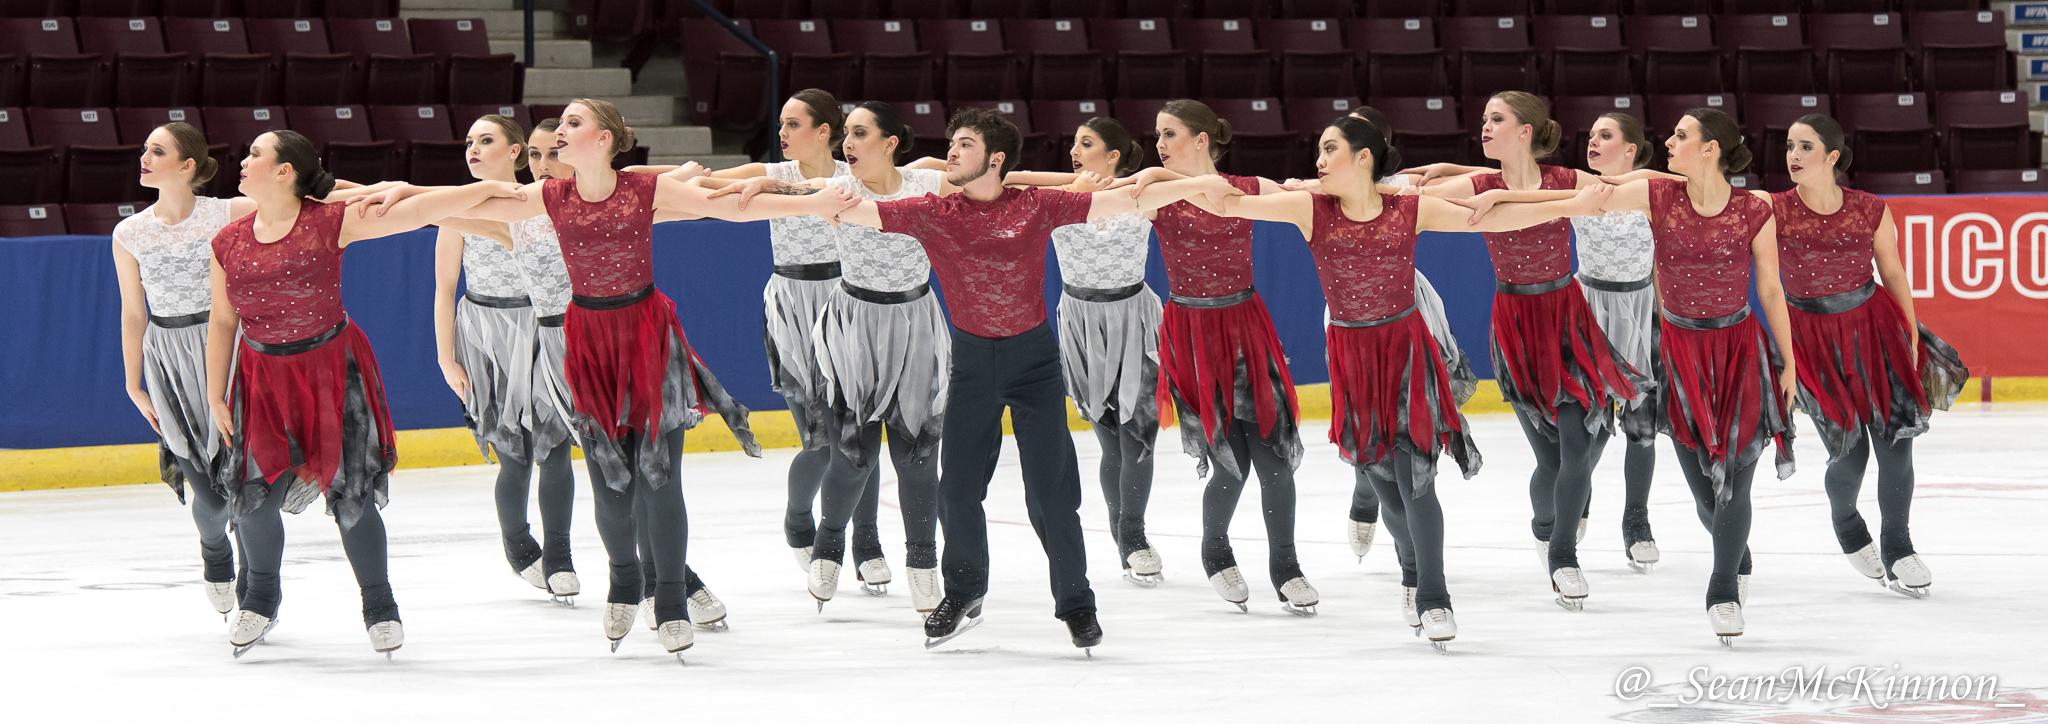 National Ice Caps Open 2016 Haunted